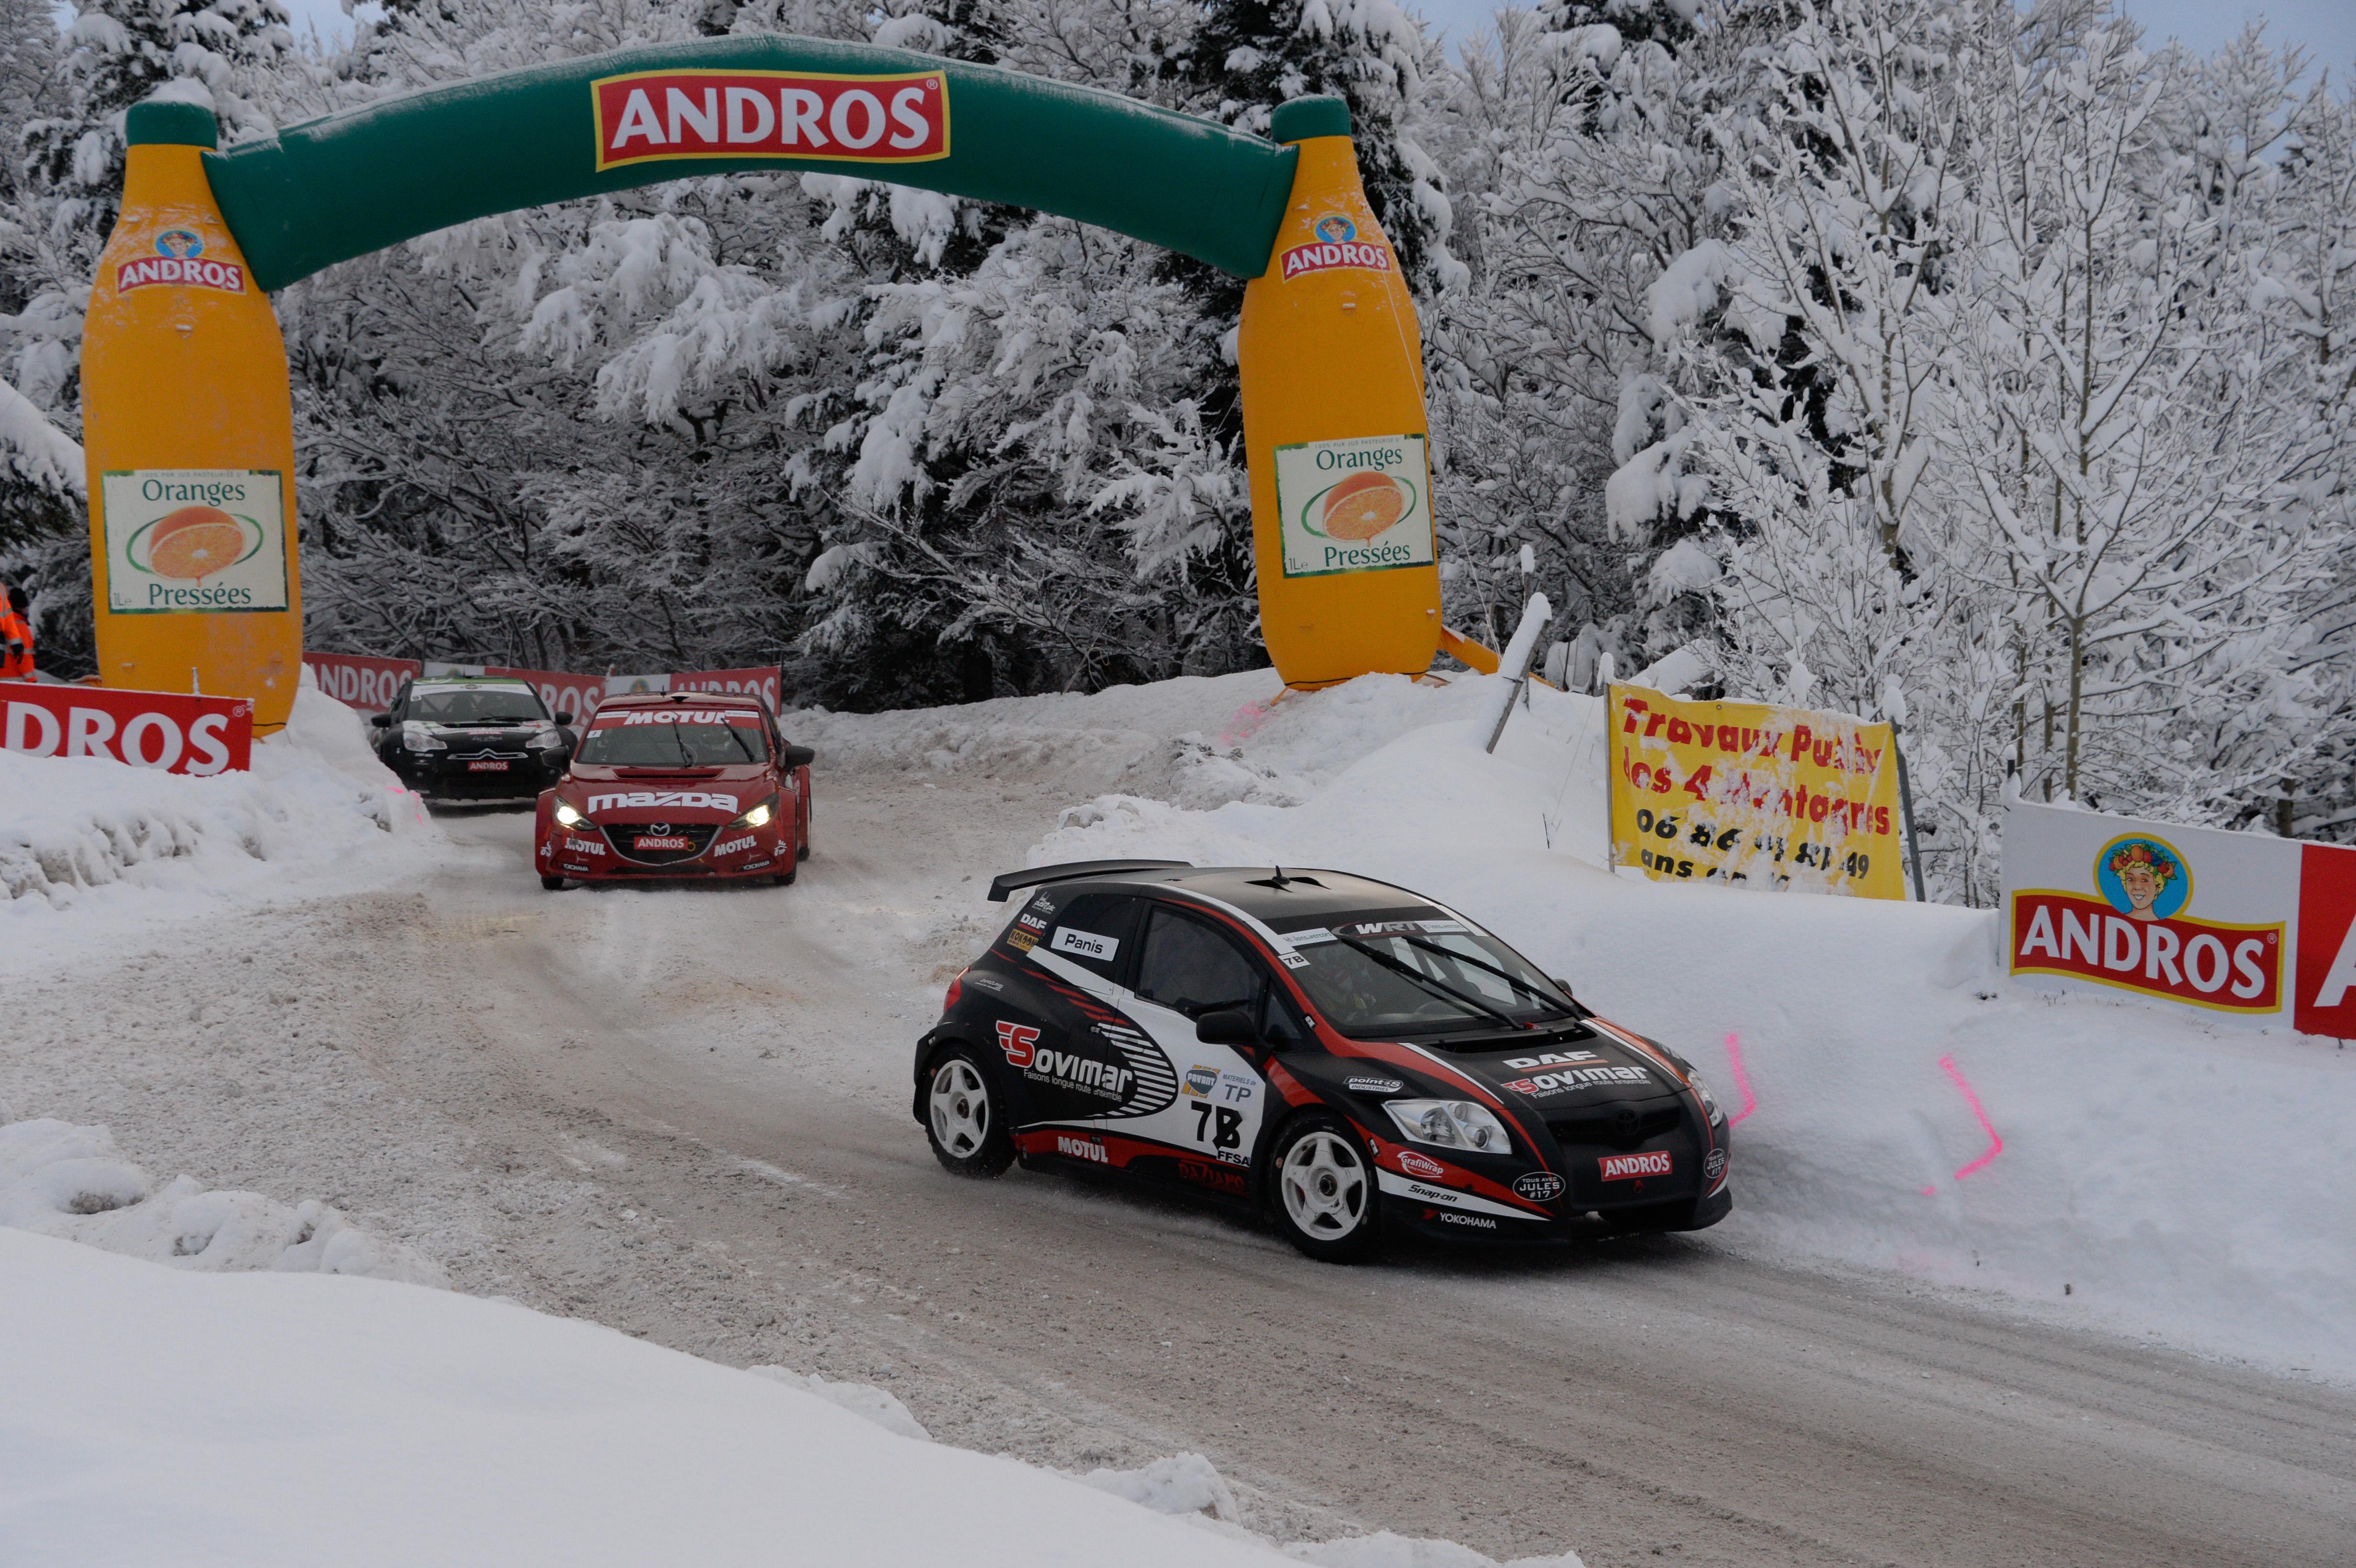 Toyota-Auris-Trophée-Andros-Lans-en-Vercors-Panis.pg